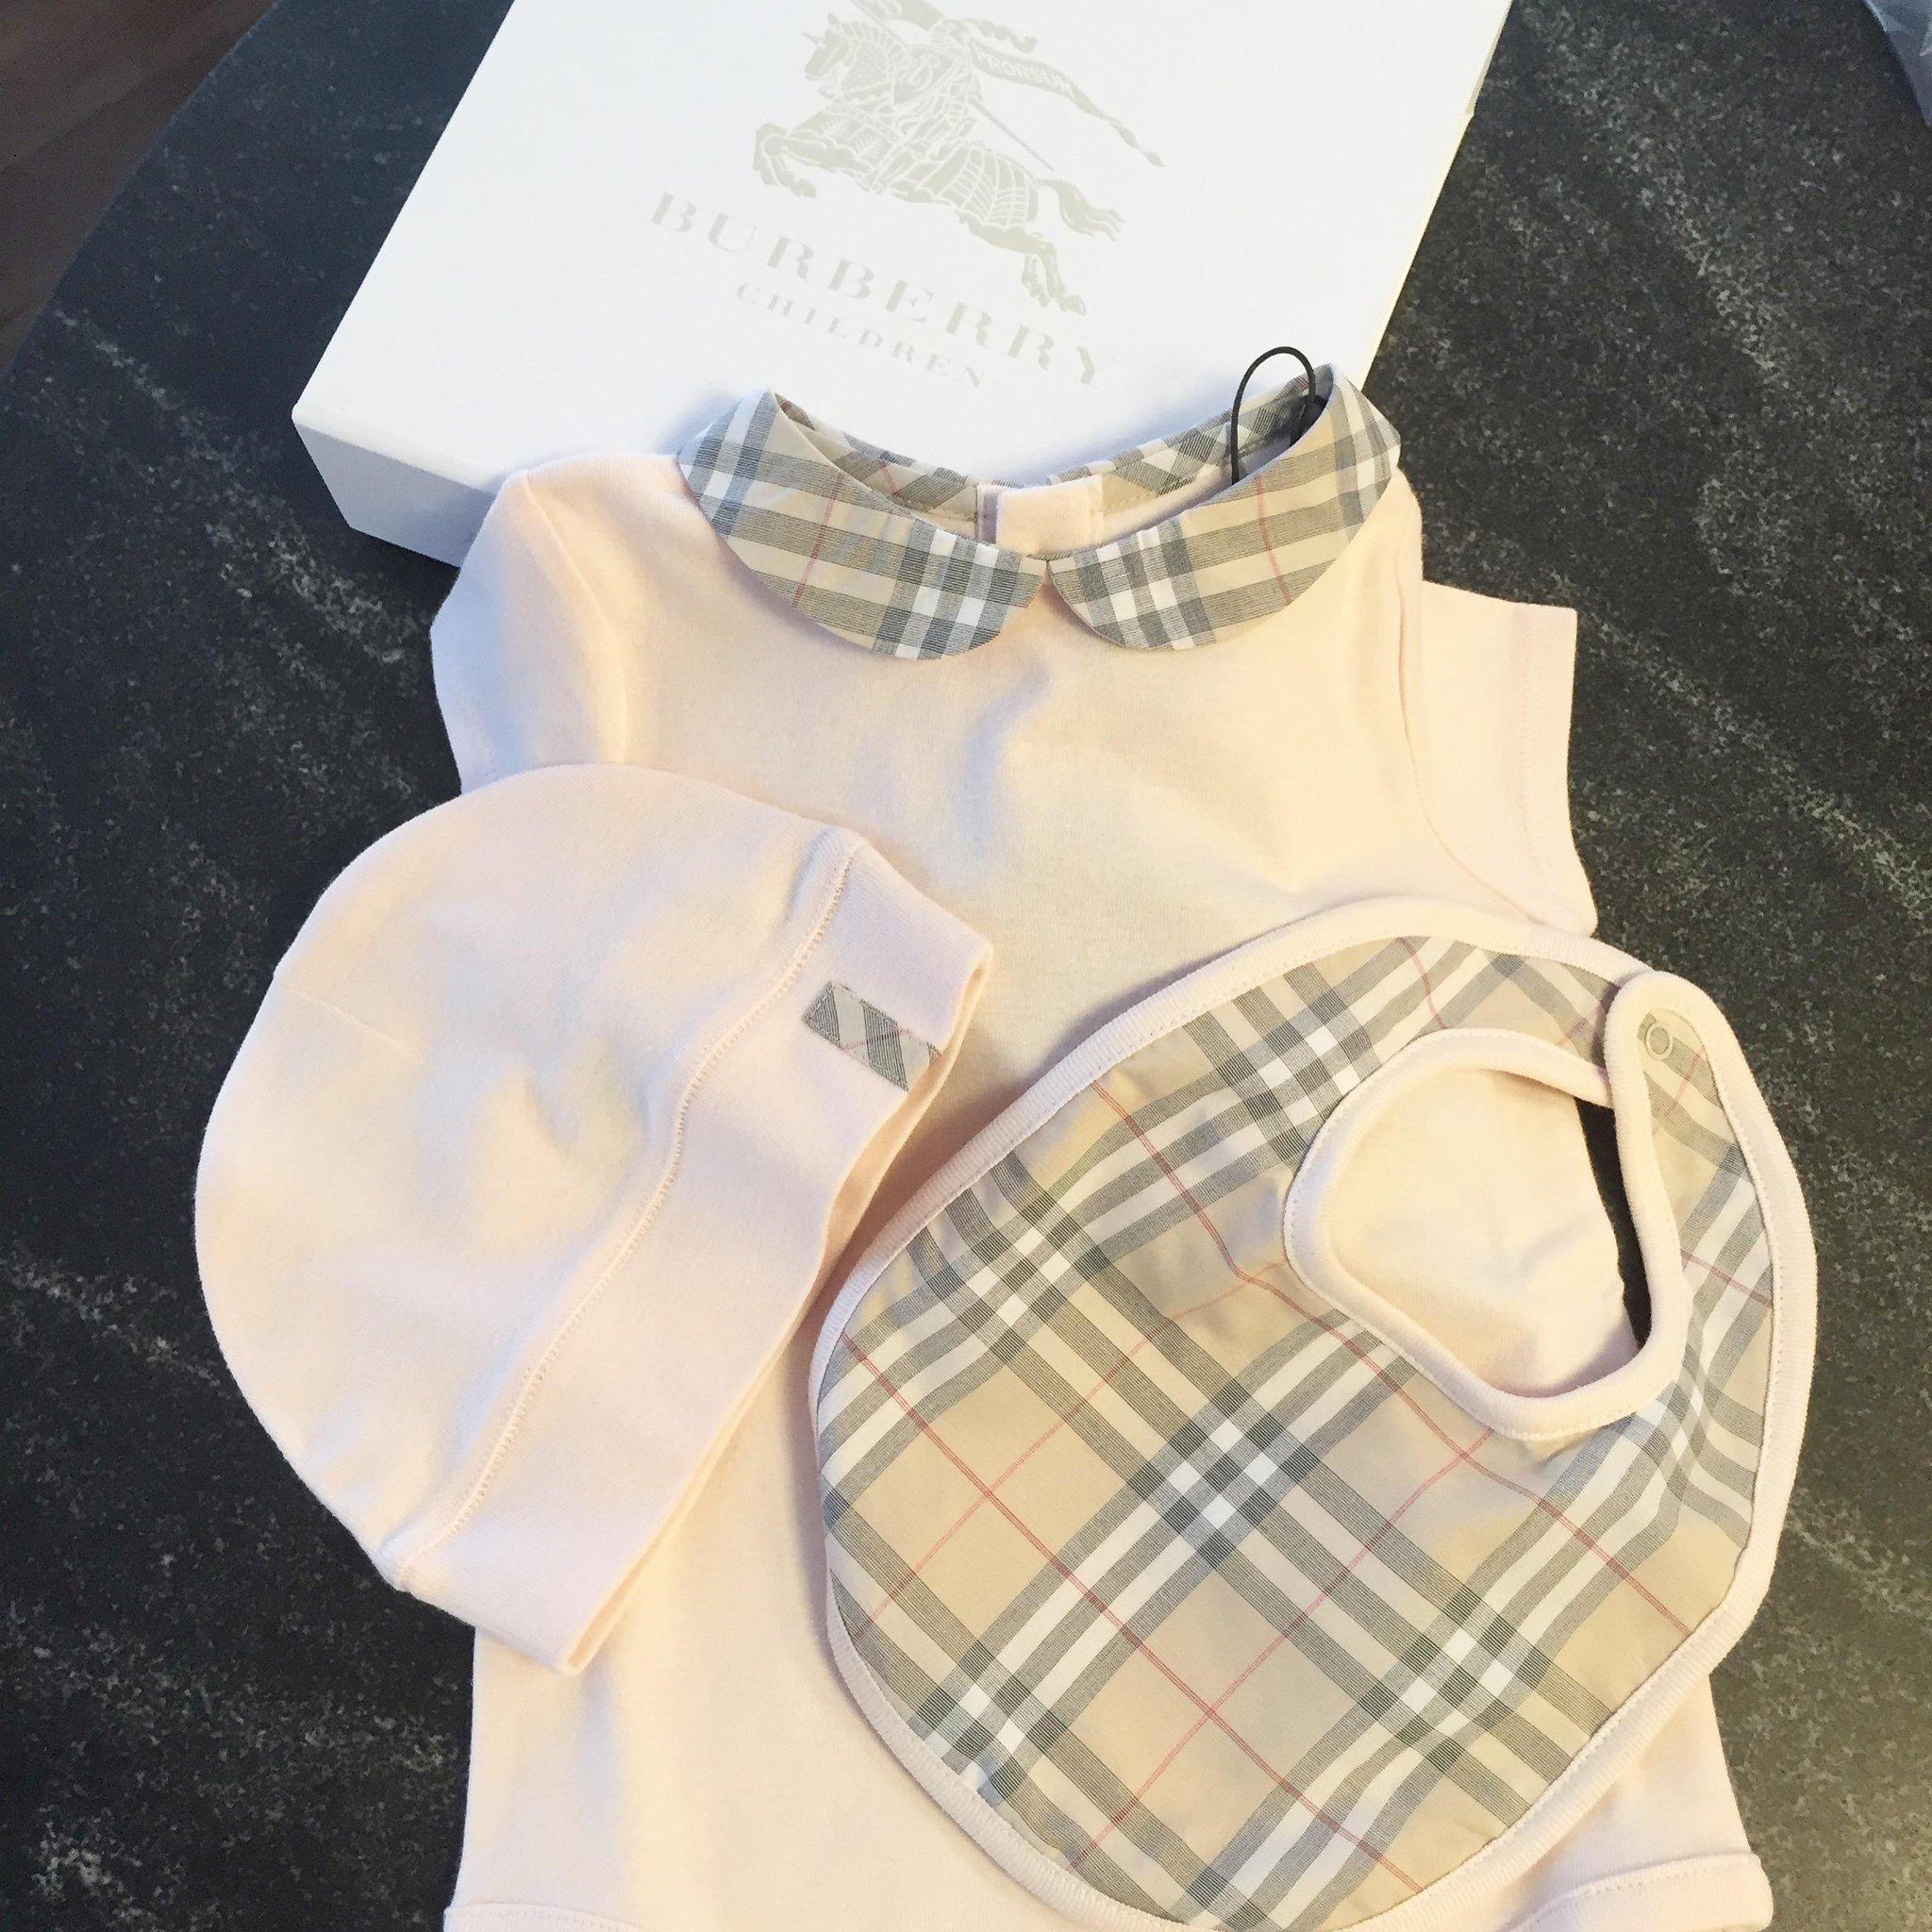 Burberry baby! https://t.co/n64p4bY834 #MiaHilton http://t.co/55YJdv4stT